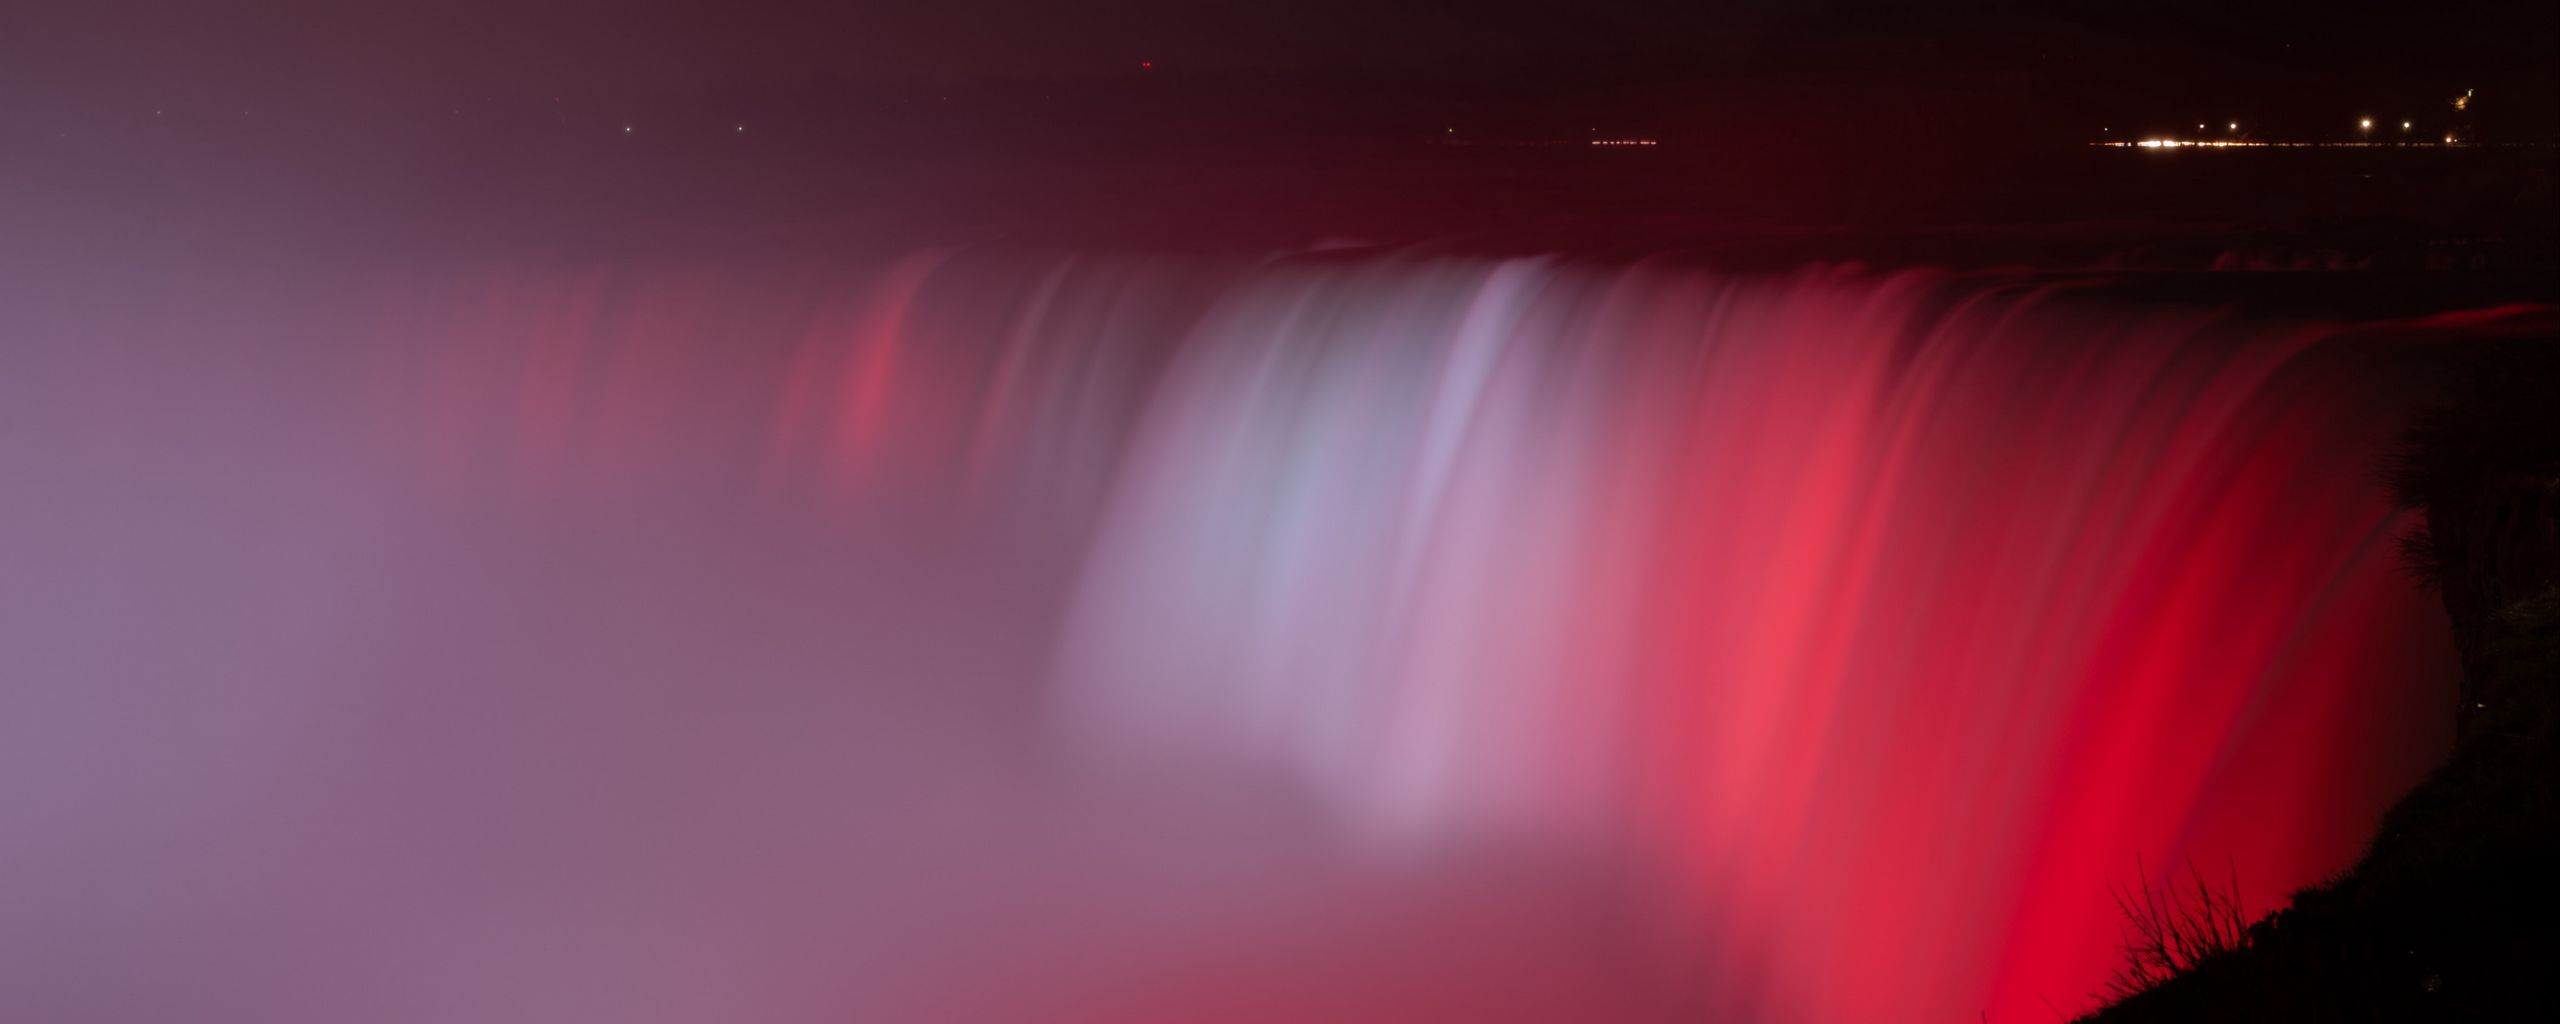 2560x1024 Wallpaper waterfall, fog, backlight, red, dark